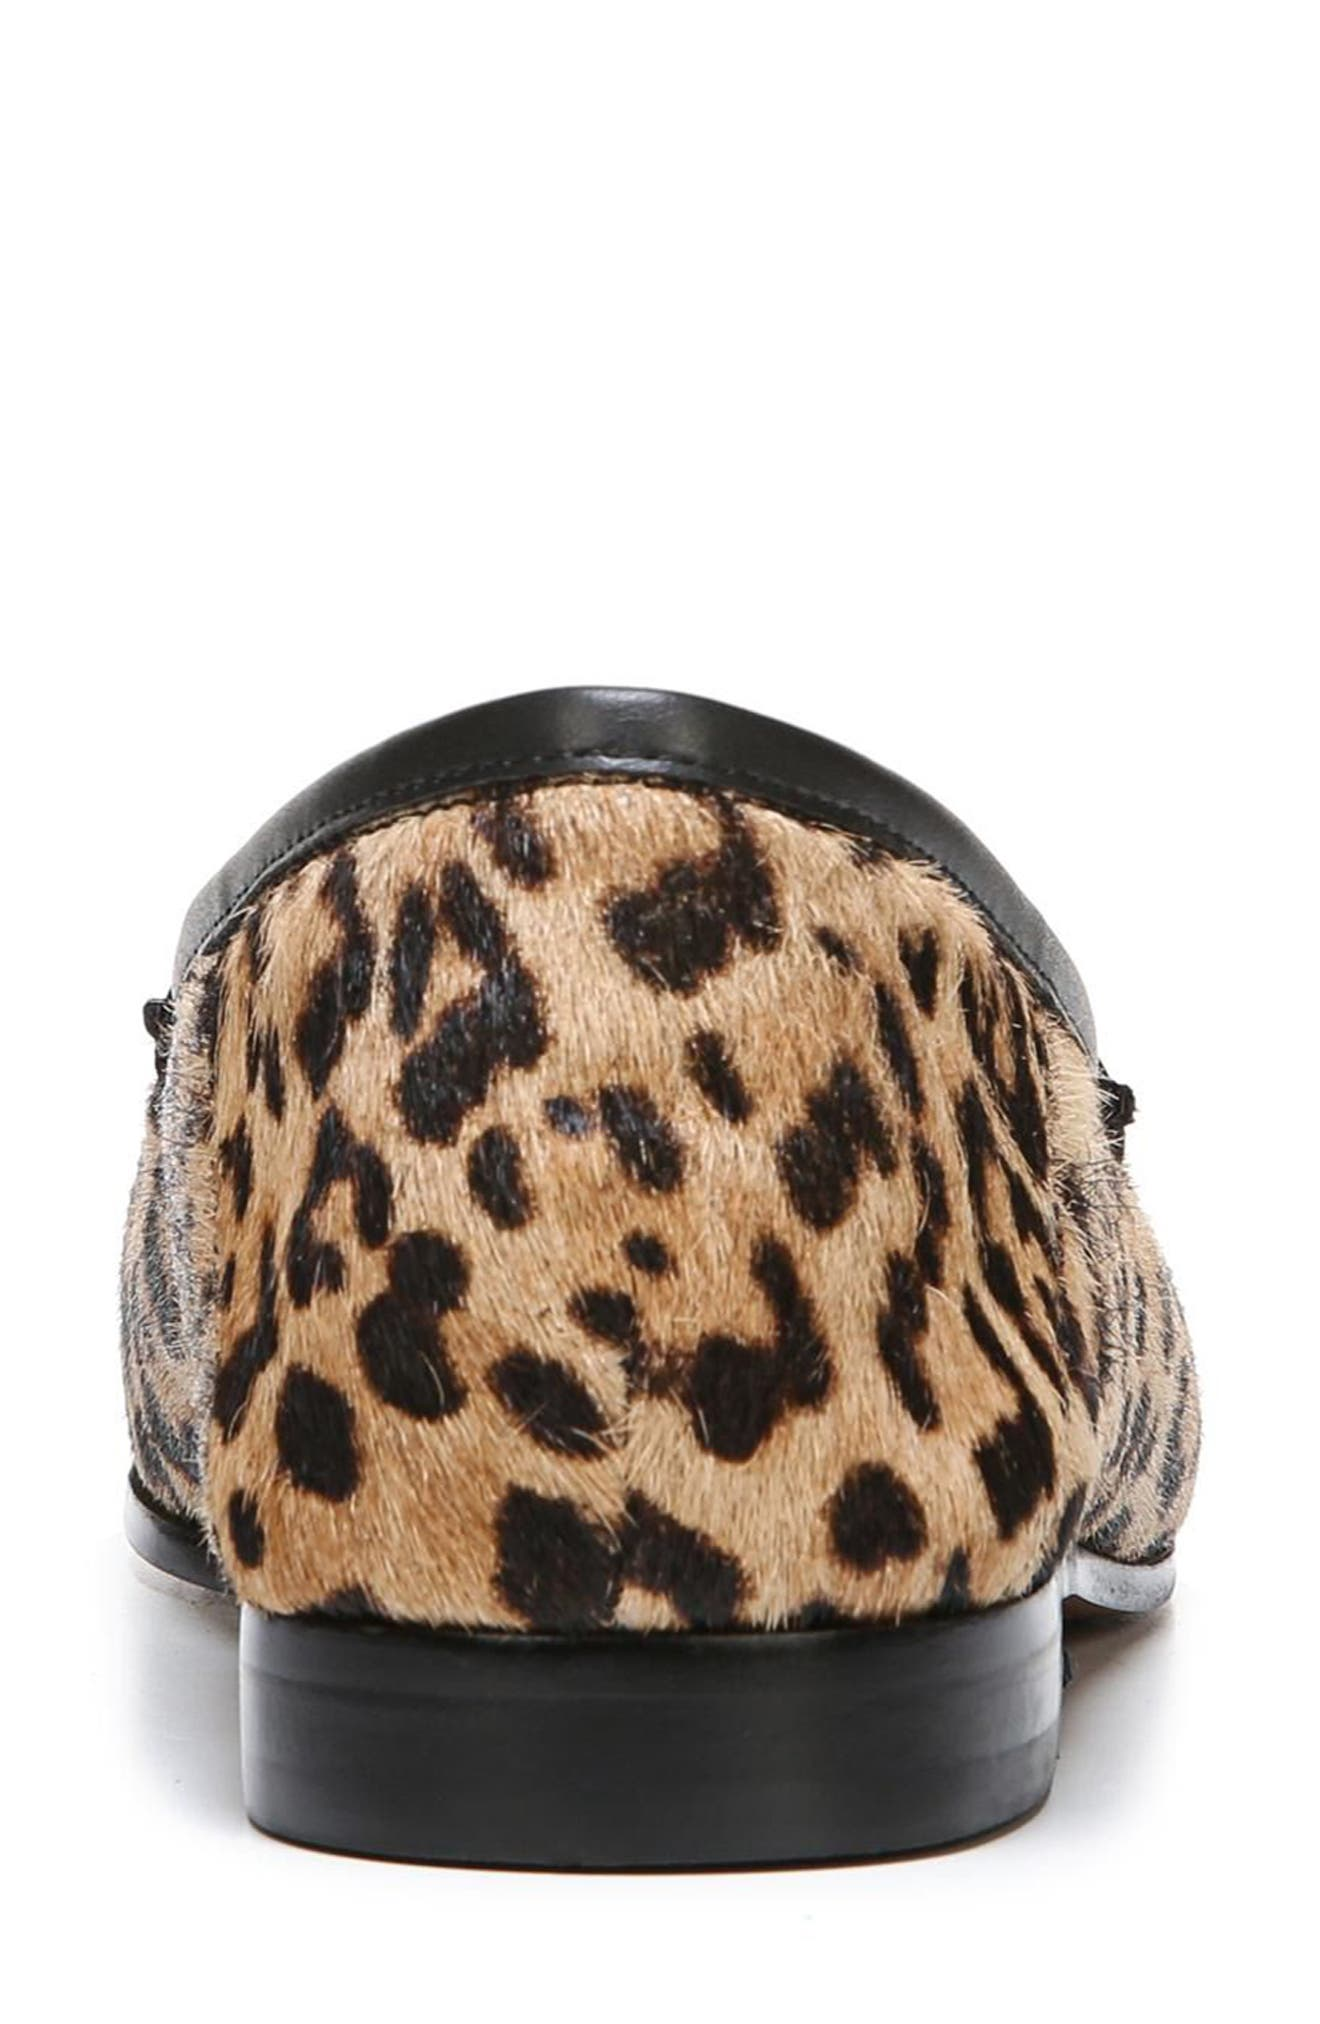 Lior Genuine Calf Hair Loafer,                             Alternate thumbnail 7, color,                             SAND LEOPARD CALF HAIR